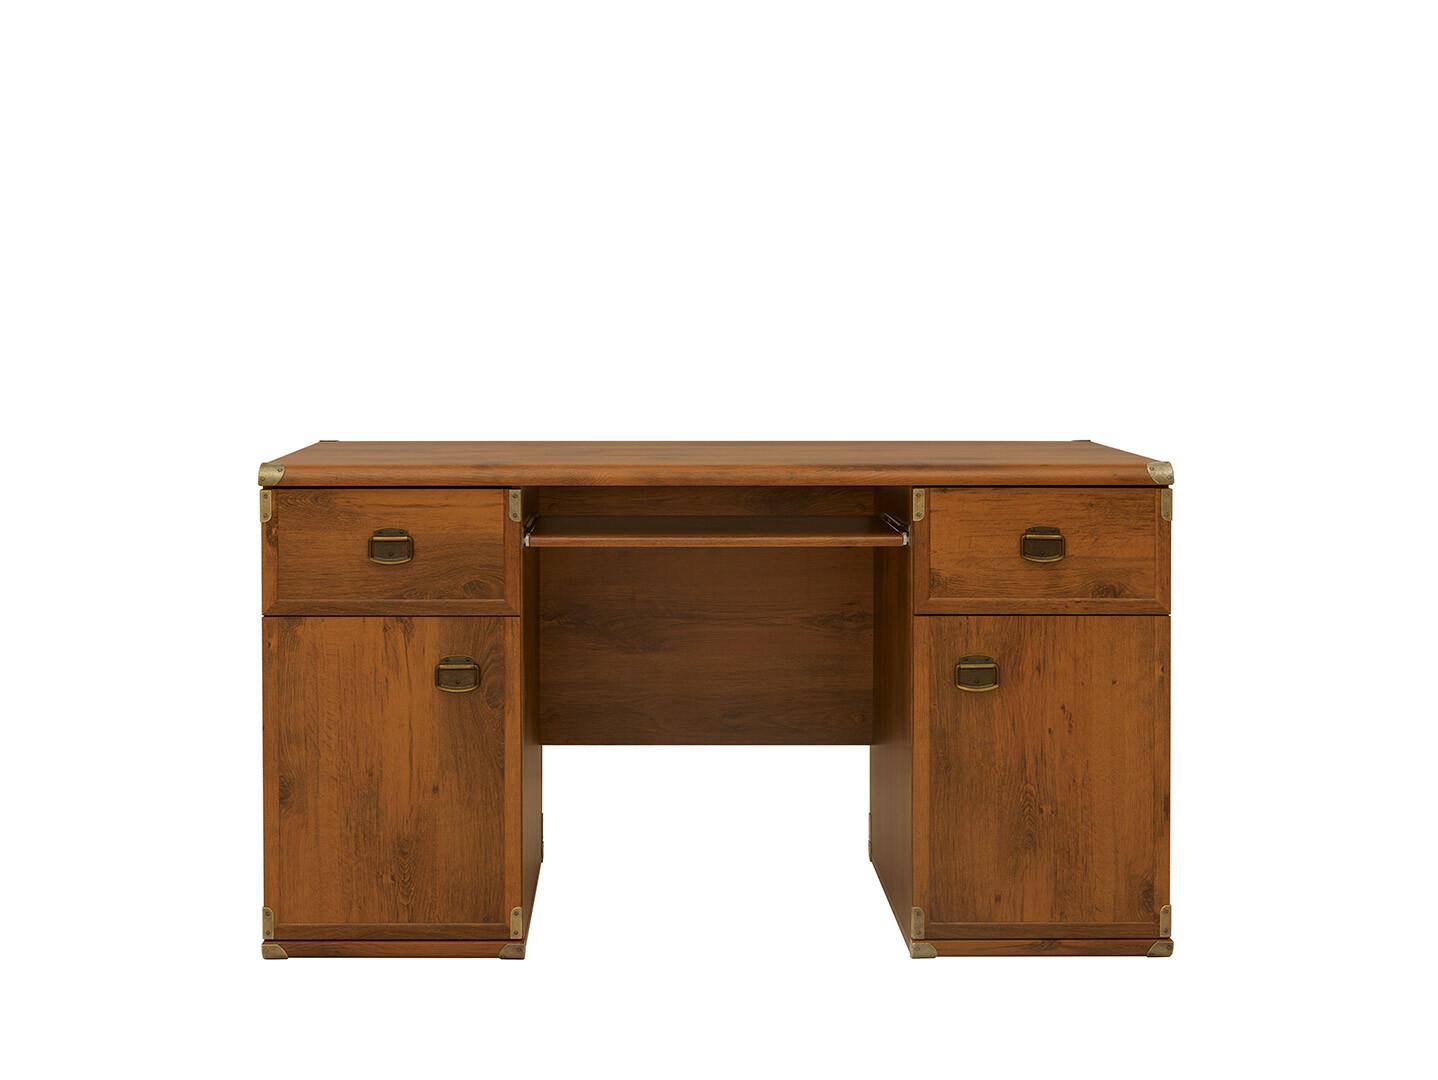 Kancelársky stôl INDIANA JBIU 2D2S dub sutter